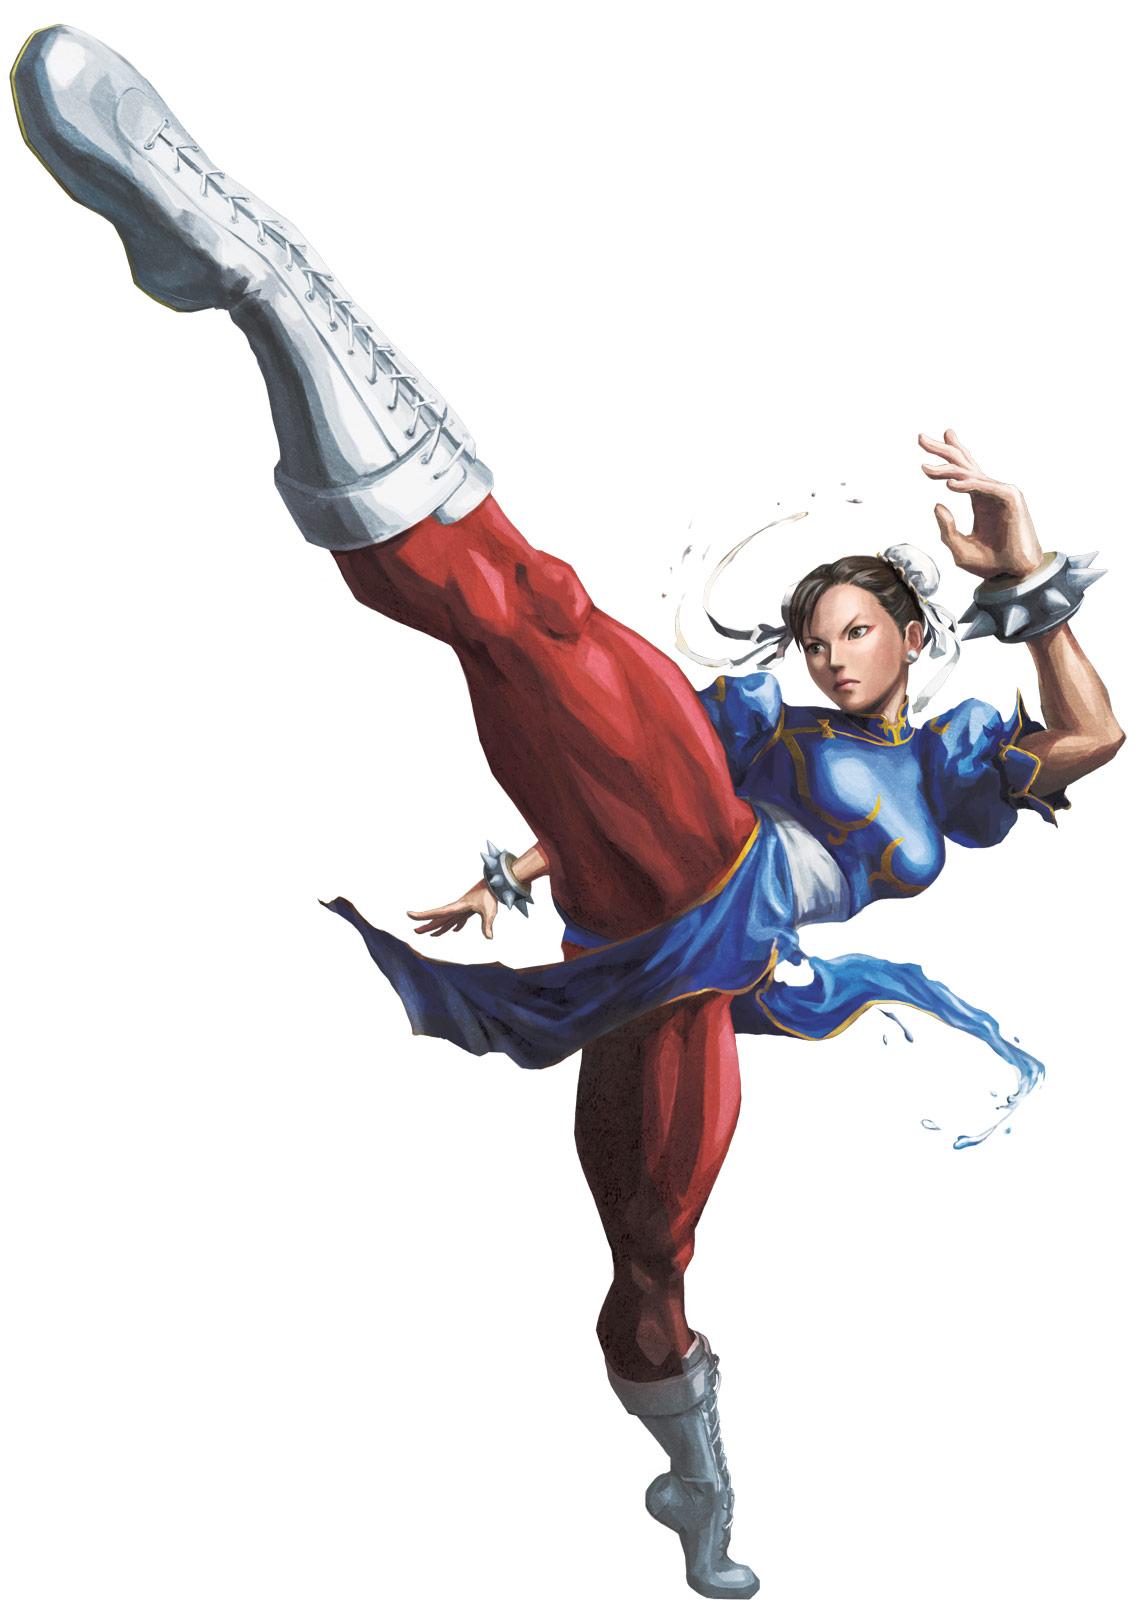 Street Fighter Chun-Li Wallpapers - Wallpaper Cave